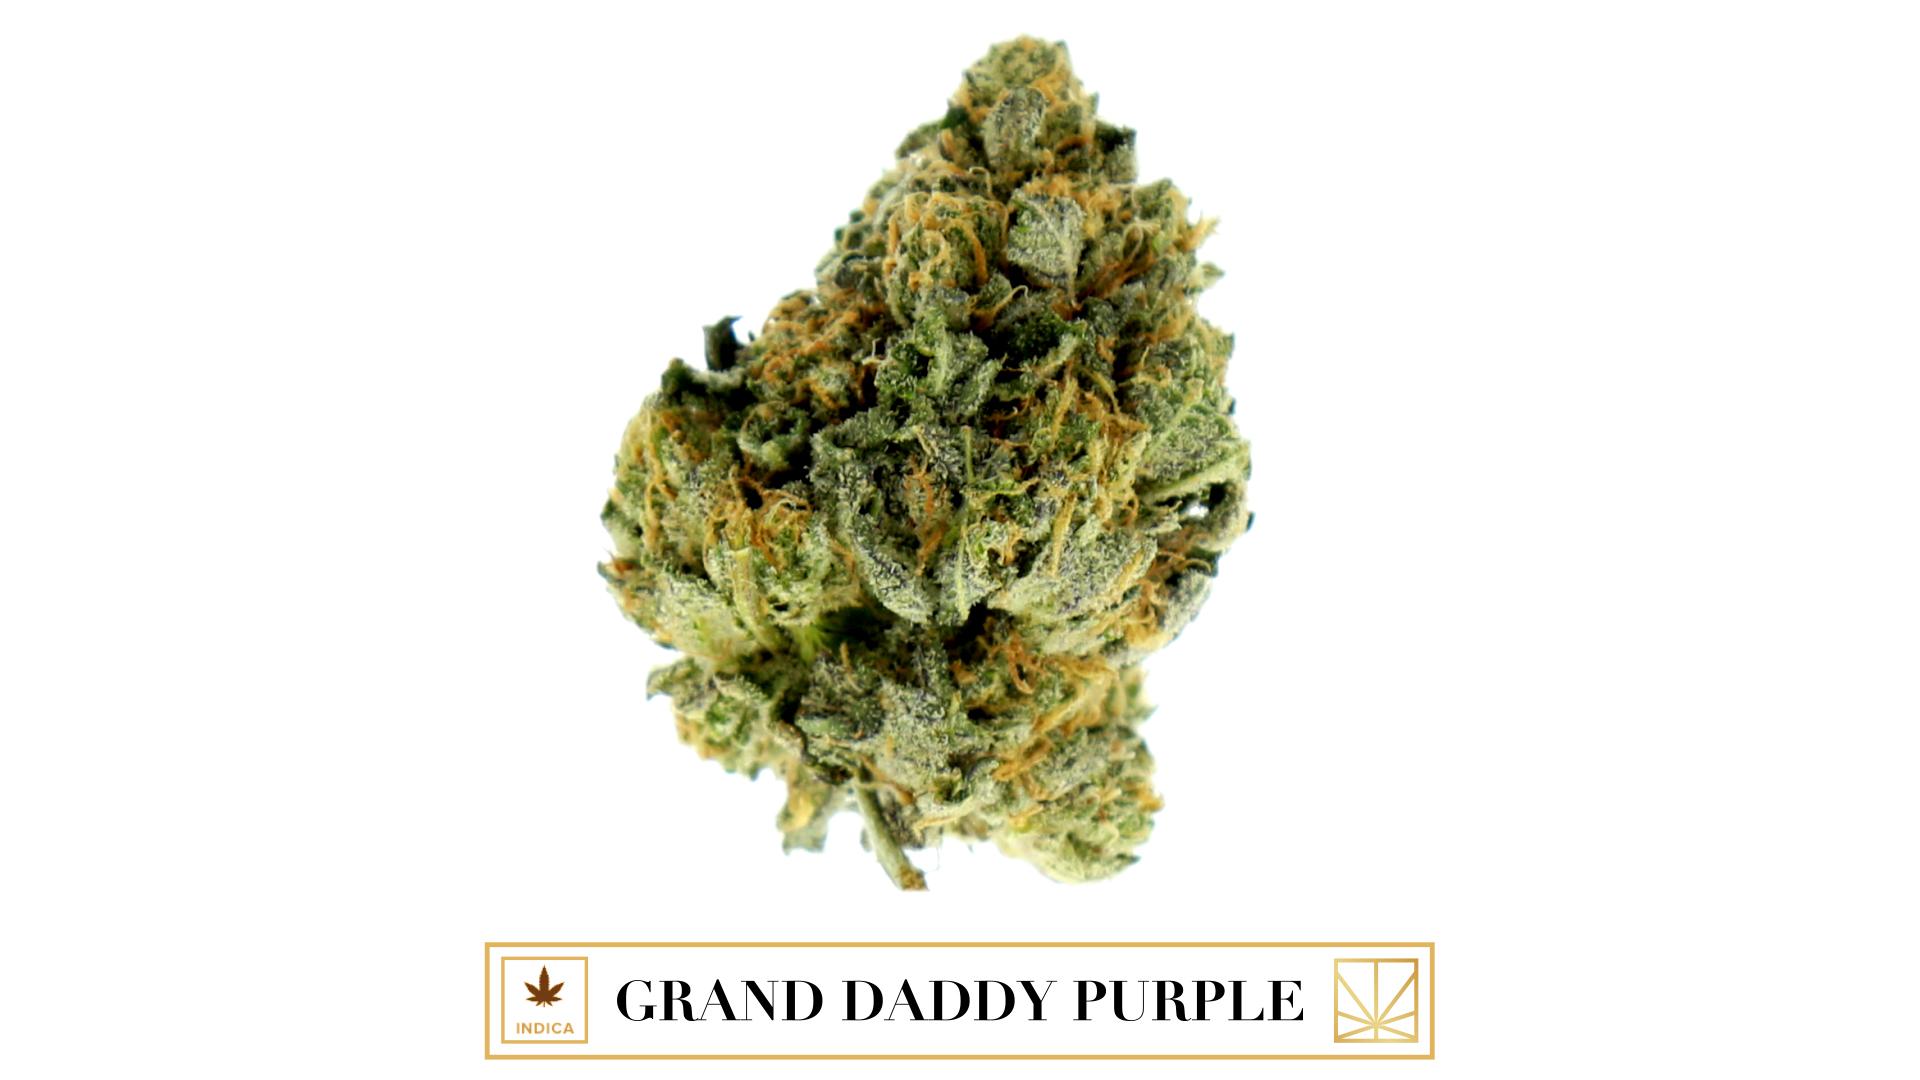 Granddaddypurple 00000